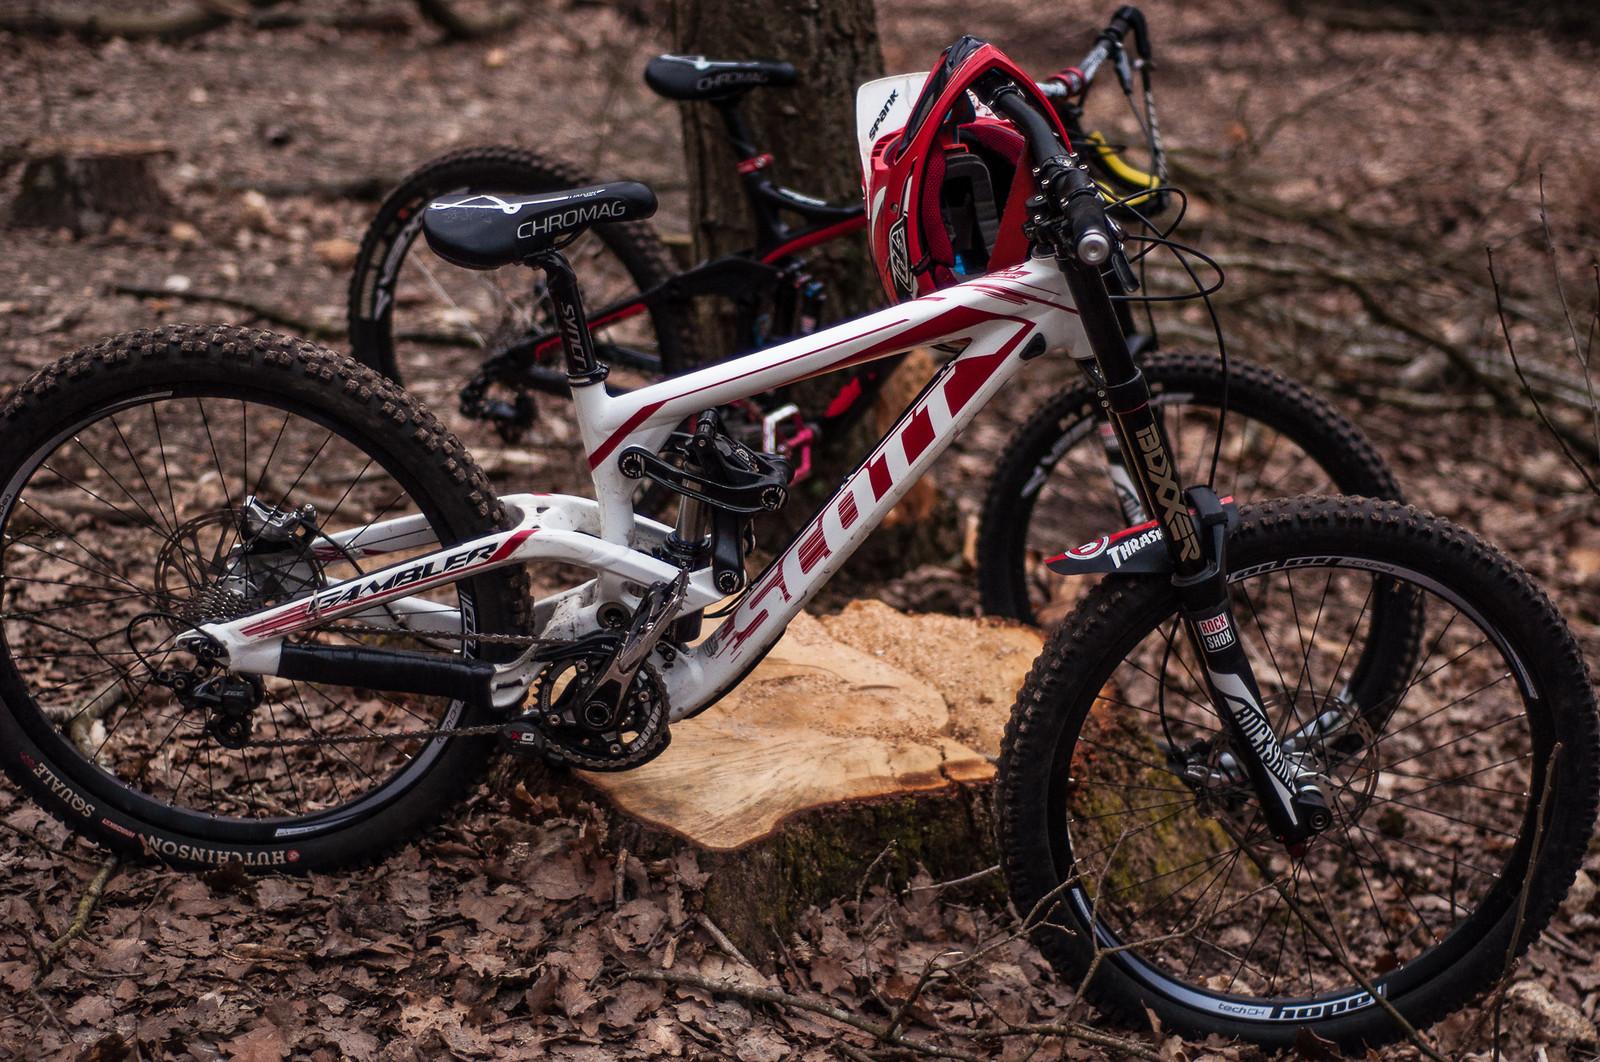 The beast  - Romuald_Manach - Mountain Biking Pictures - Vital MTB